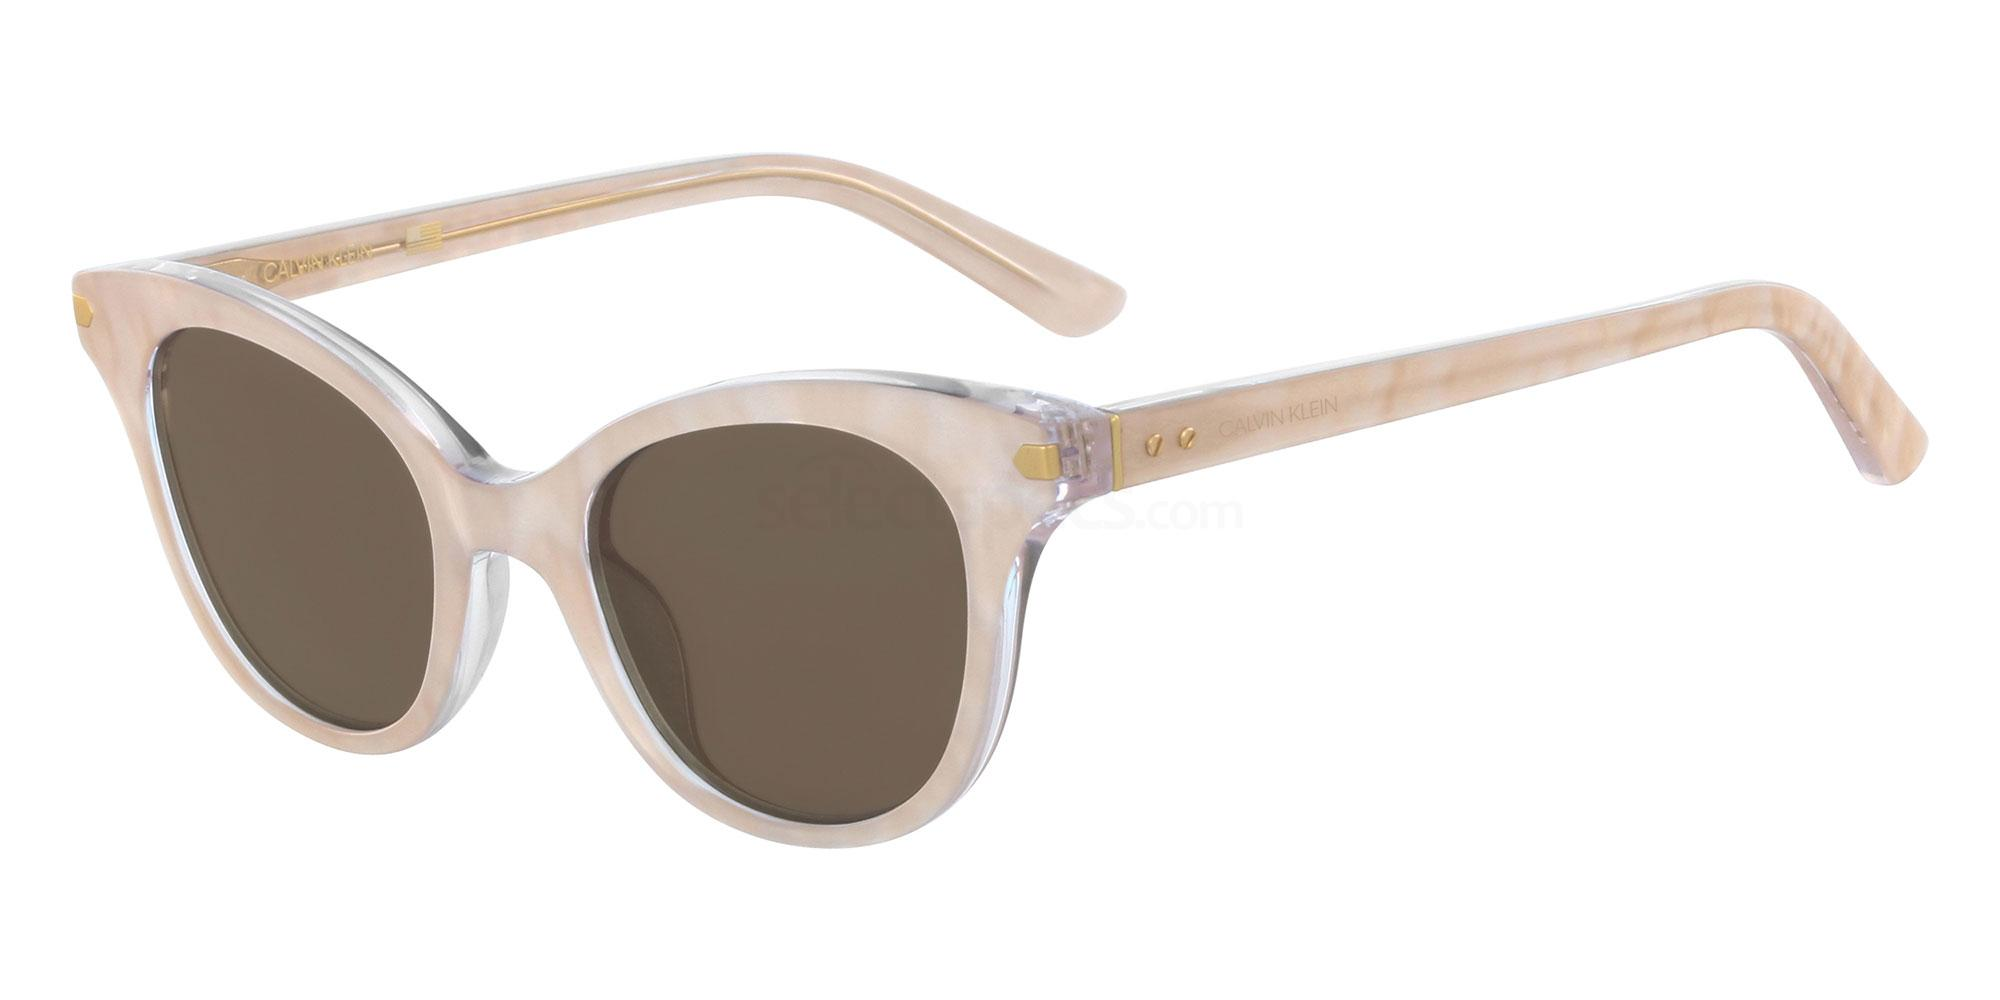 pearl sunglasses trend